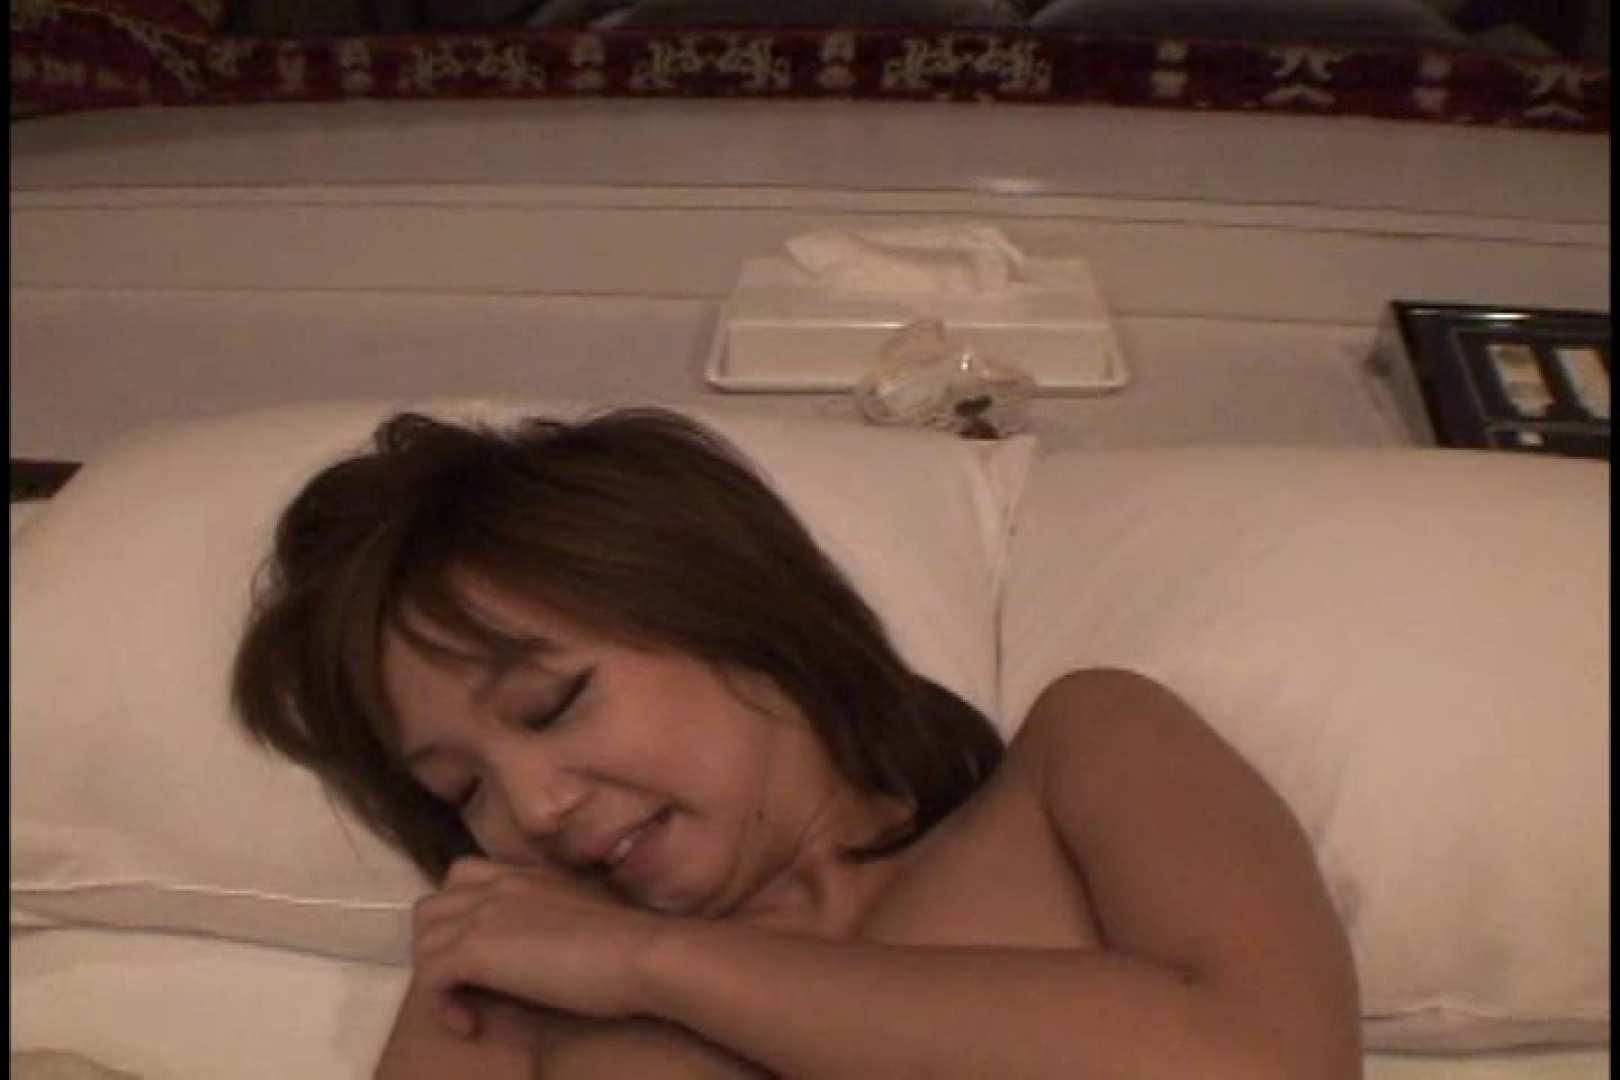 JDハンター全国ツアー vol.029 前編 女子大生のエロ生活  66連発 6